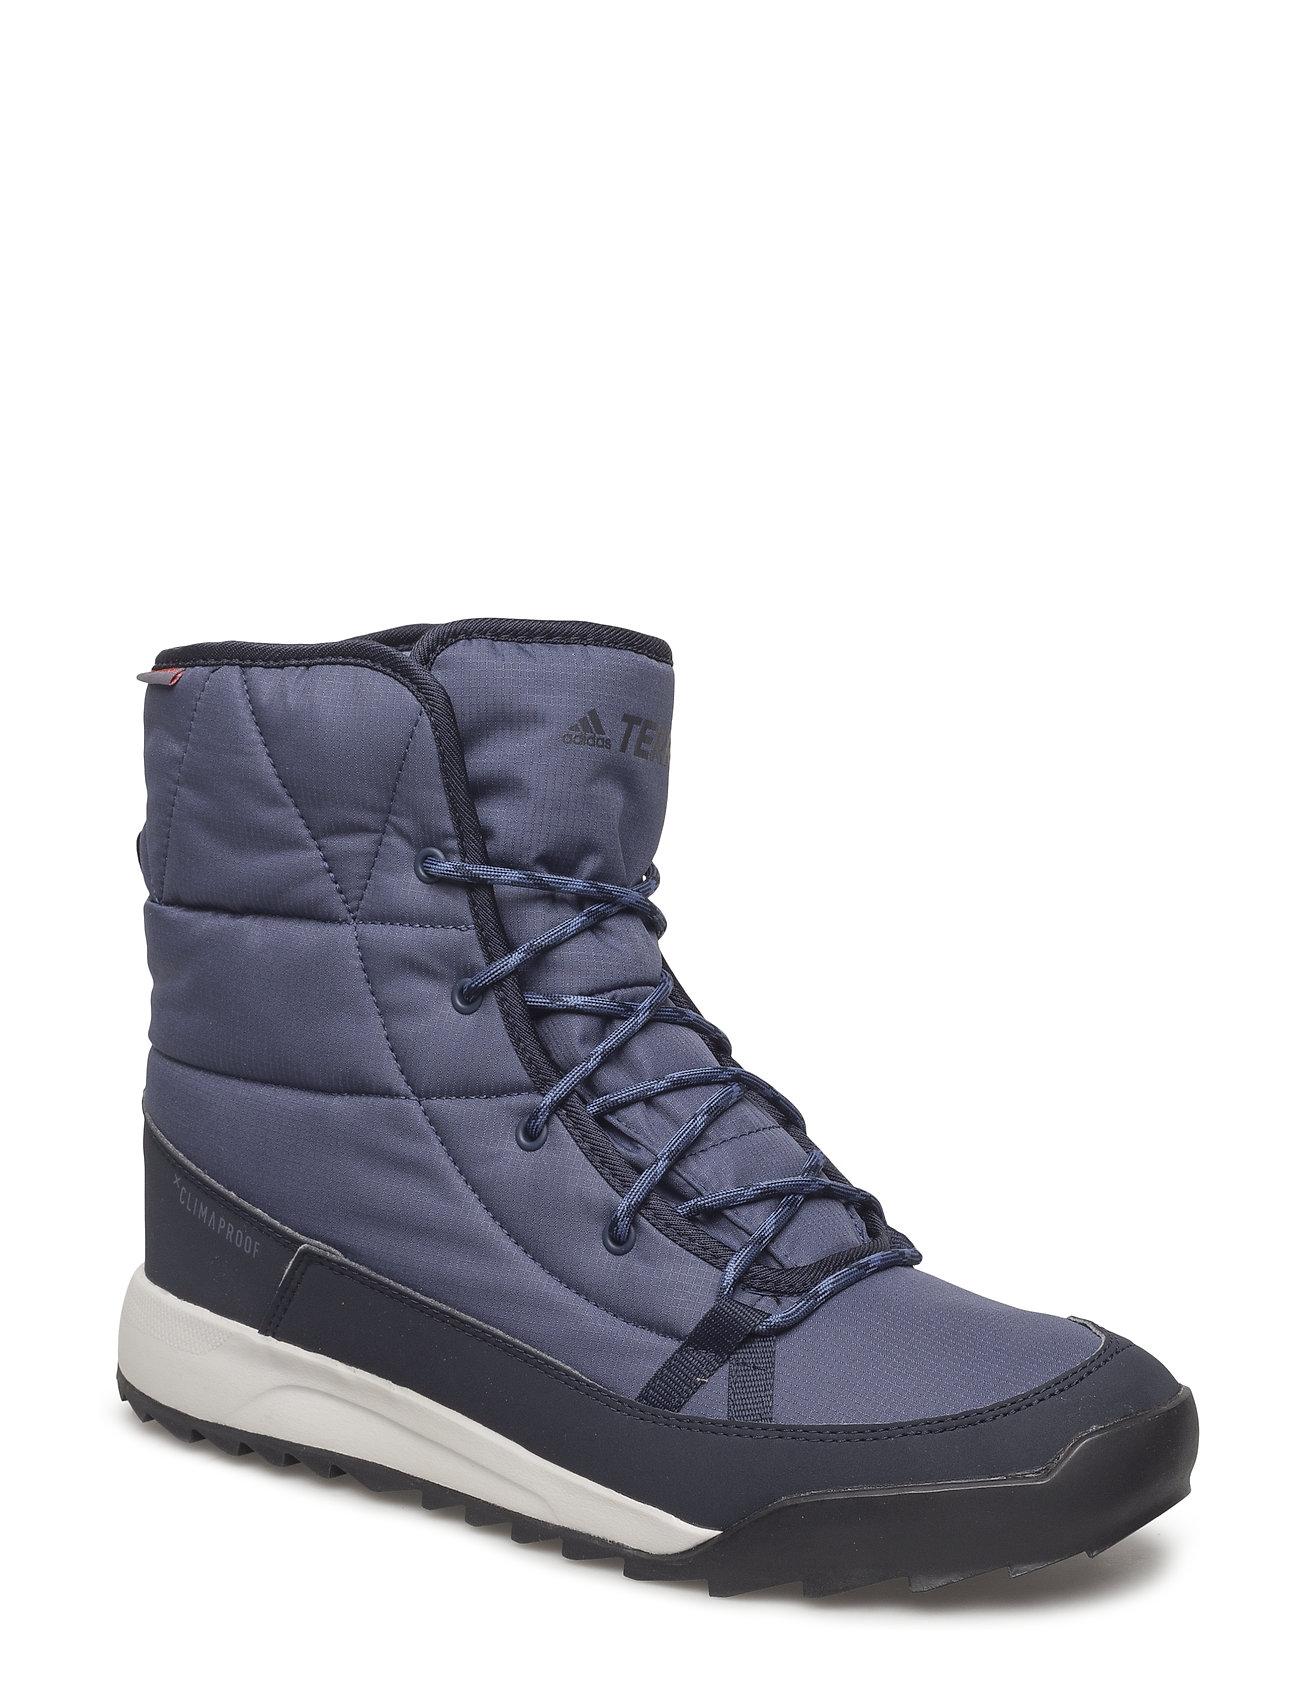 ADIDAS Terrex Choleah Padded Cp Stiefel Halbstiefel Blau ADIDAS PERFORMANCE